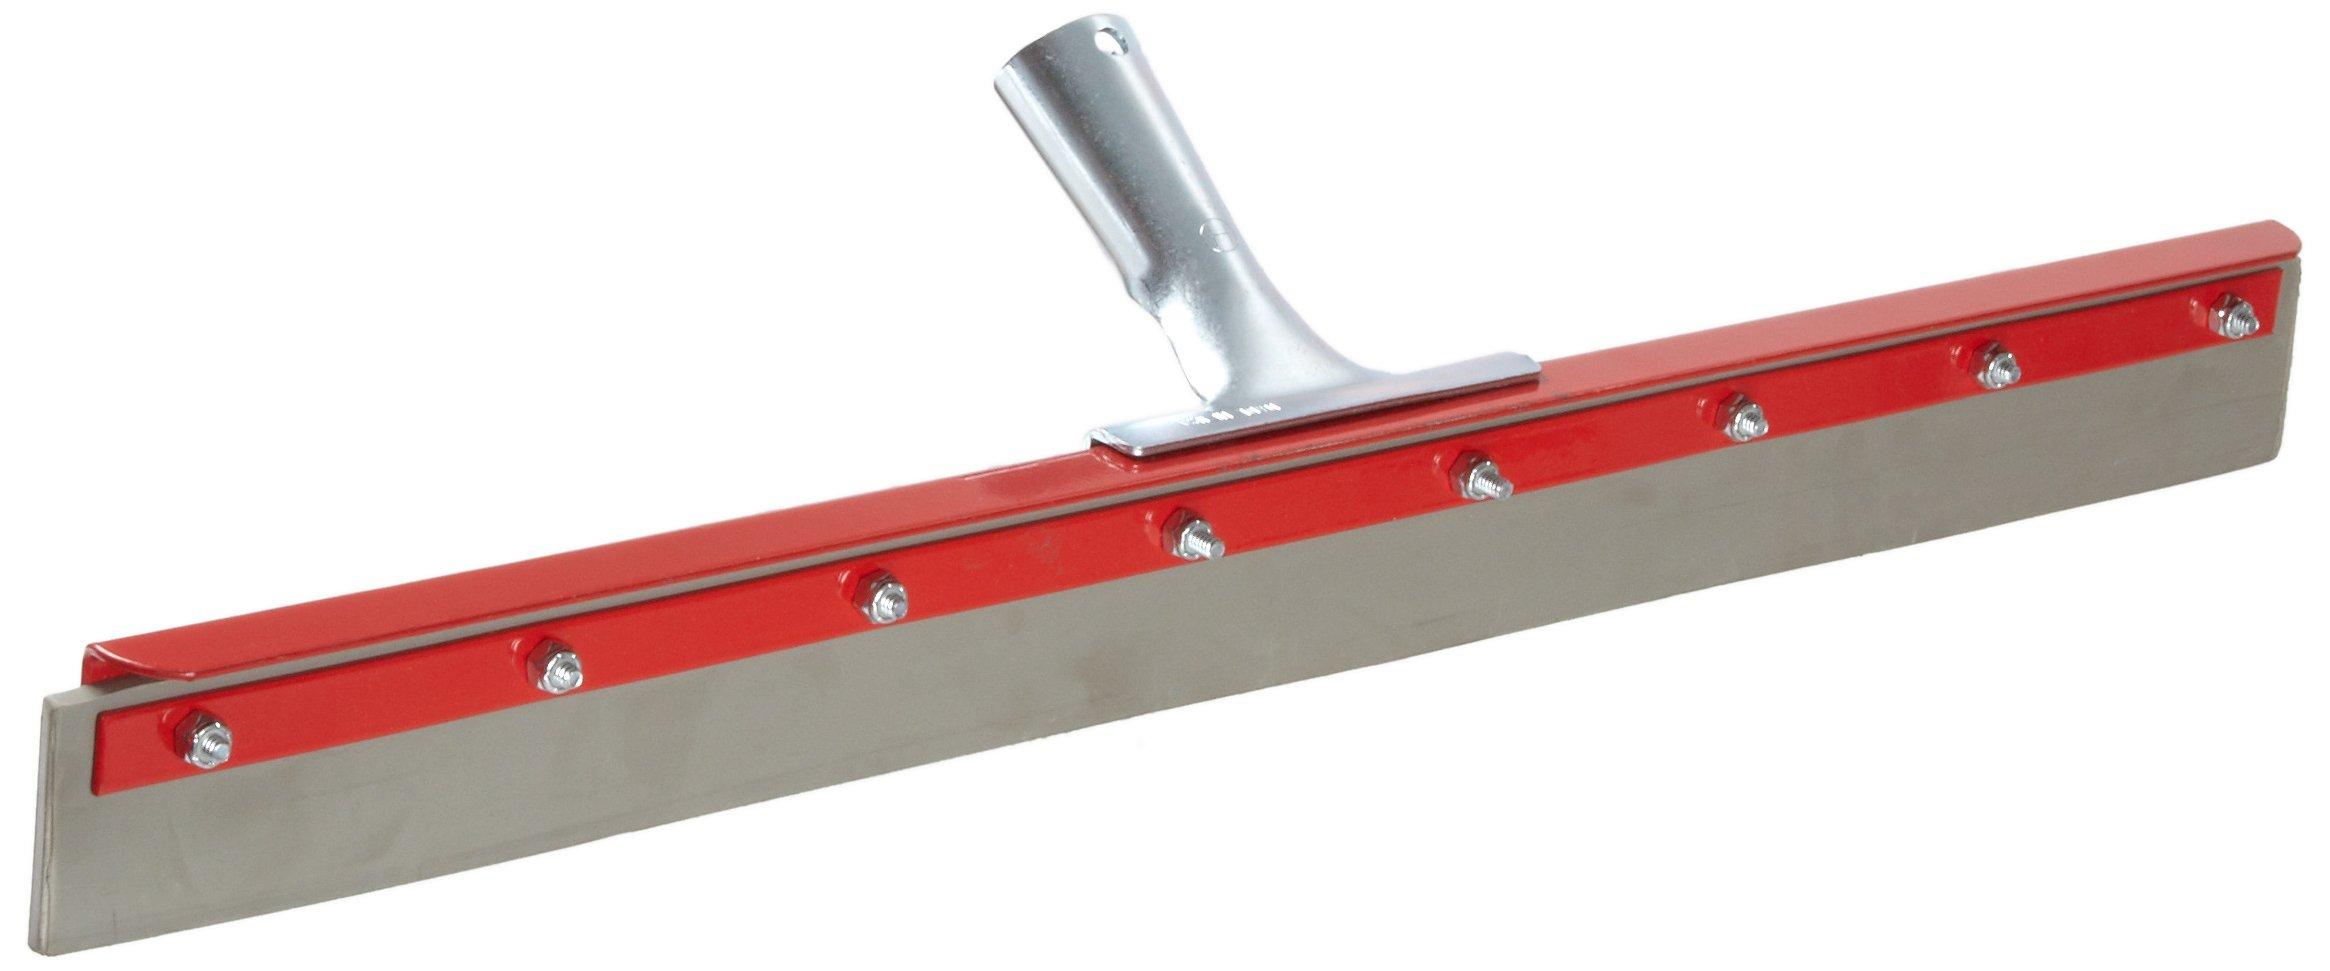 Haviland 1424 EPDM Rubber Non-Marking Heavy Duty Floor Squeegee, 24'' Length, Gray